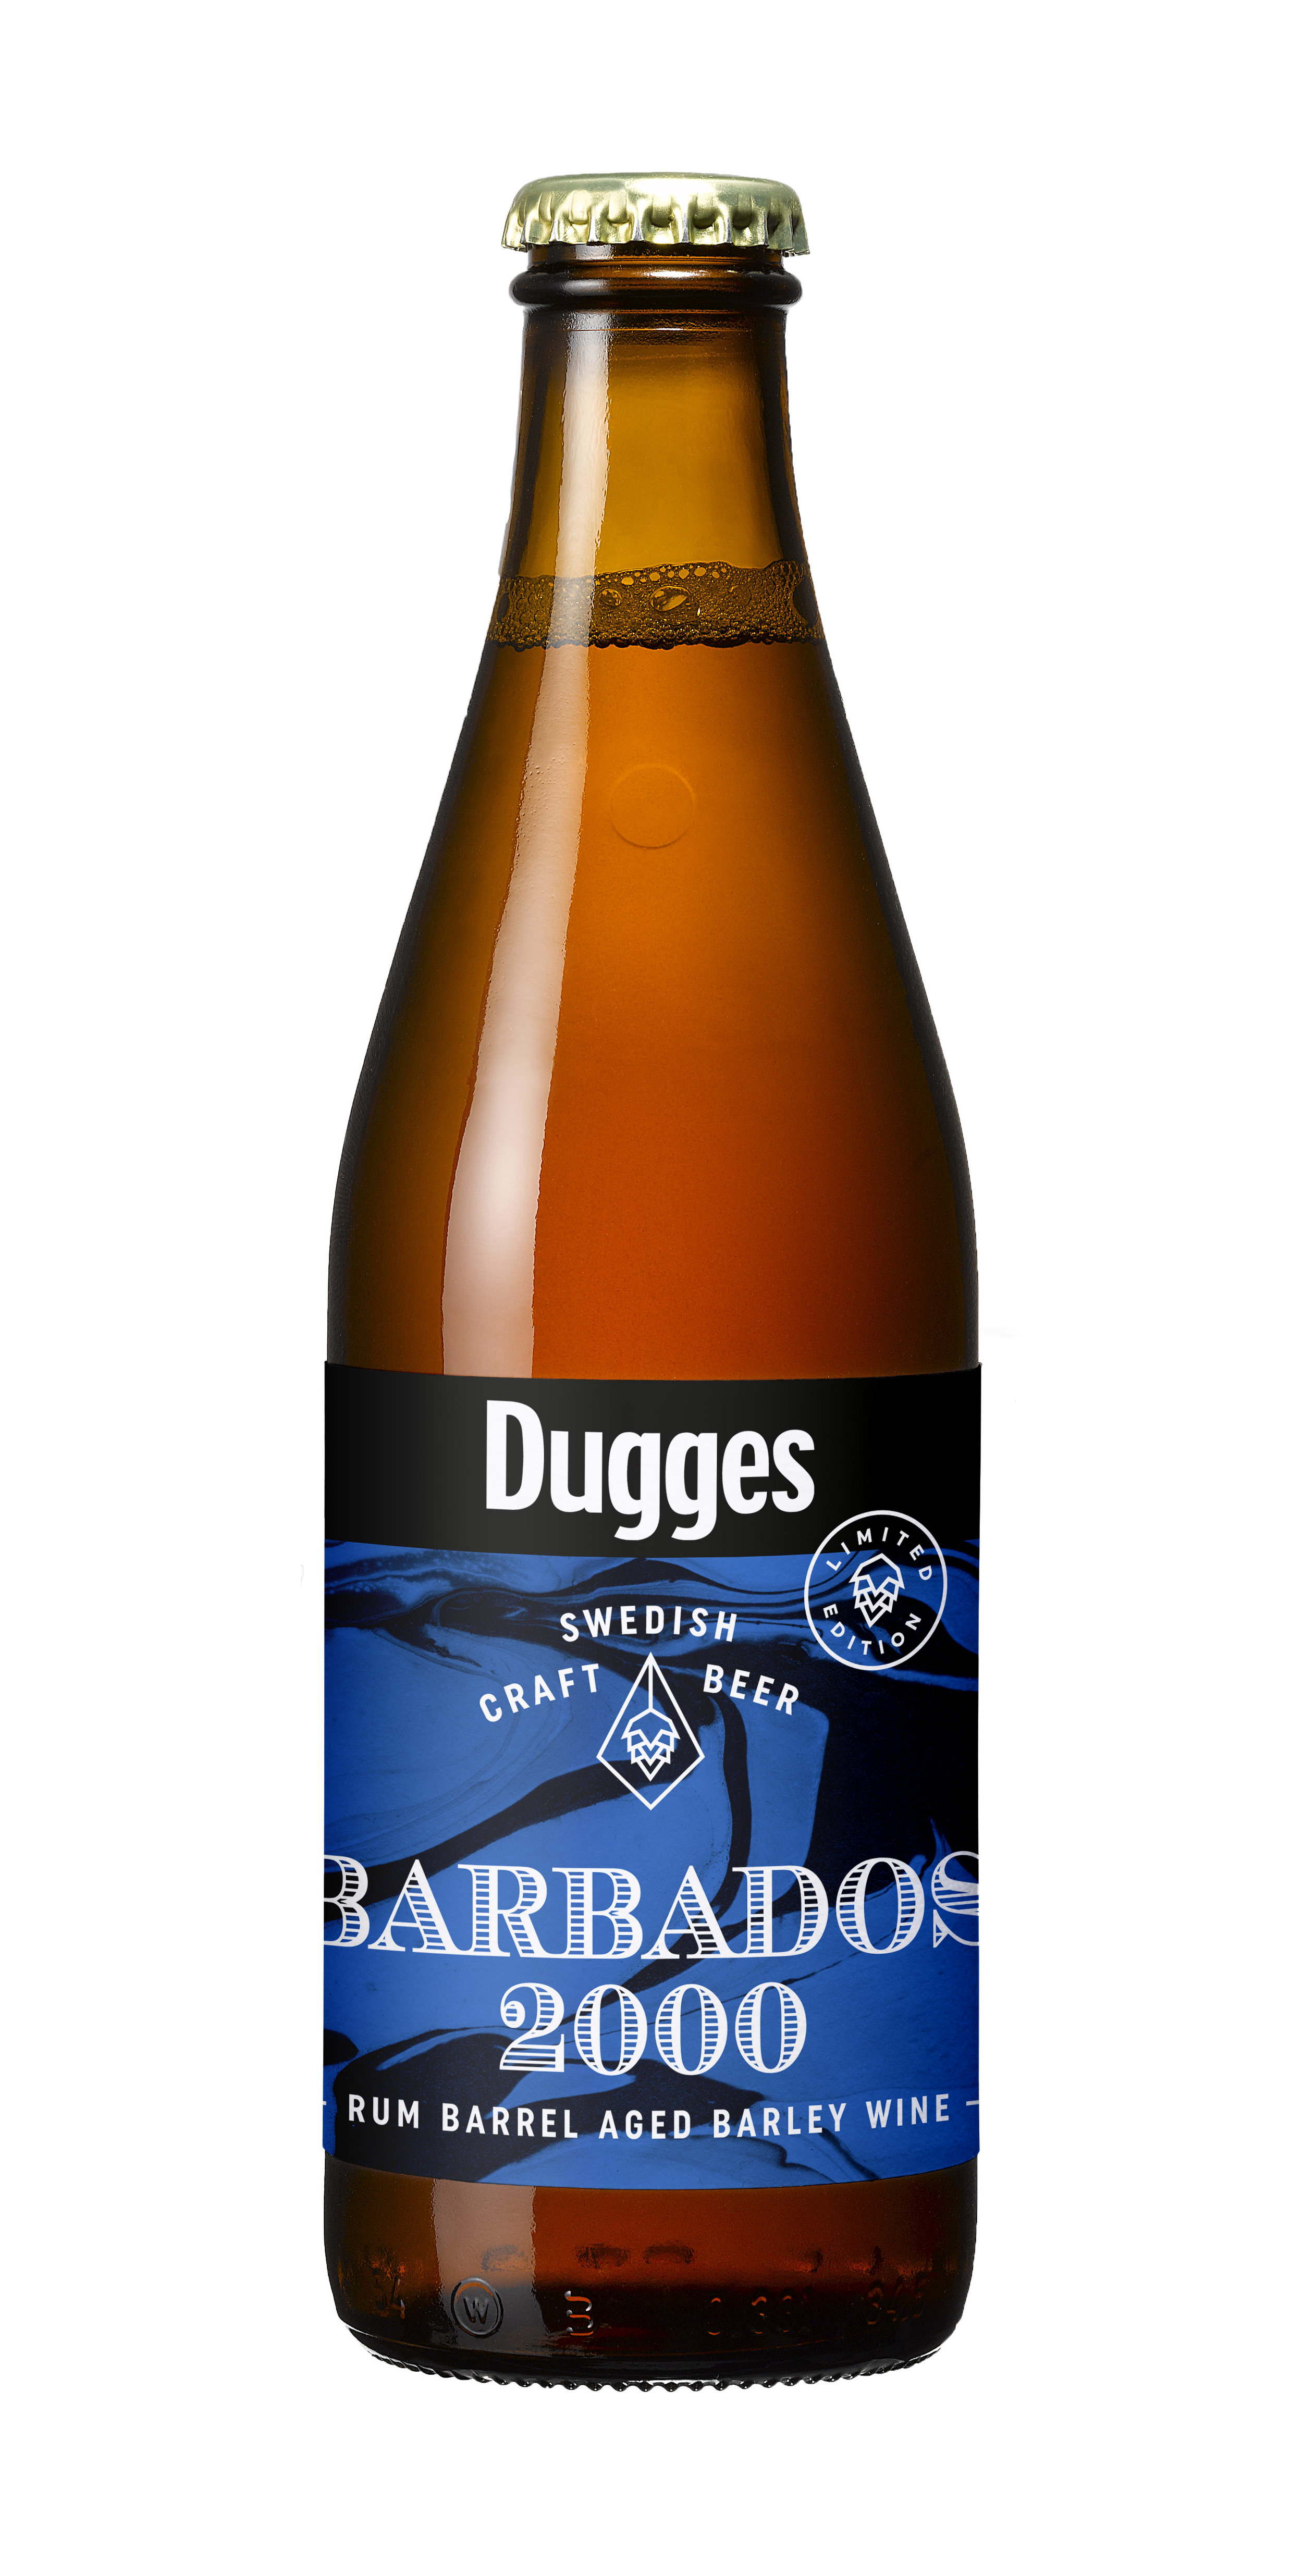 bottle_web1_Barbados2000.jpg